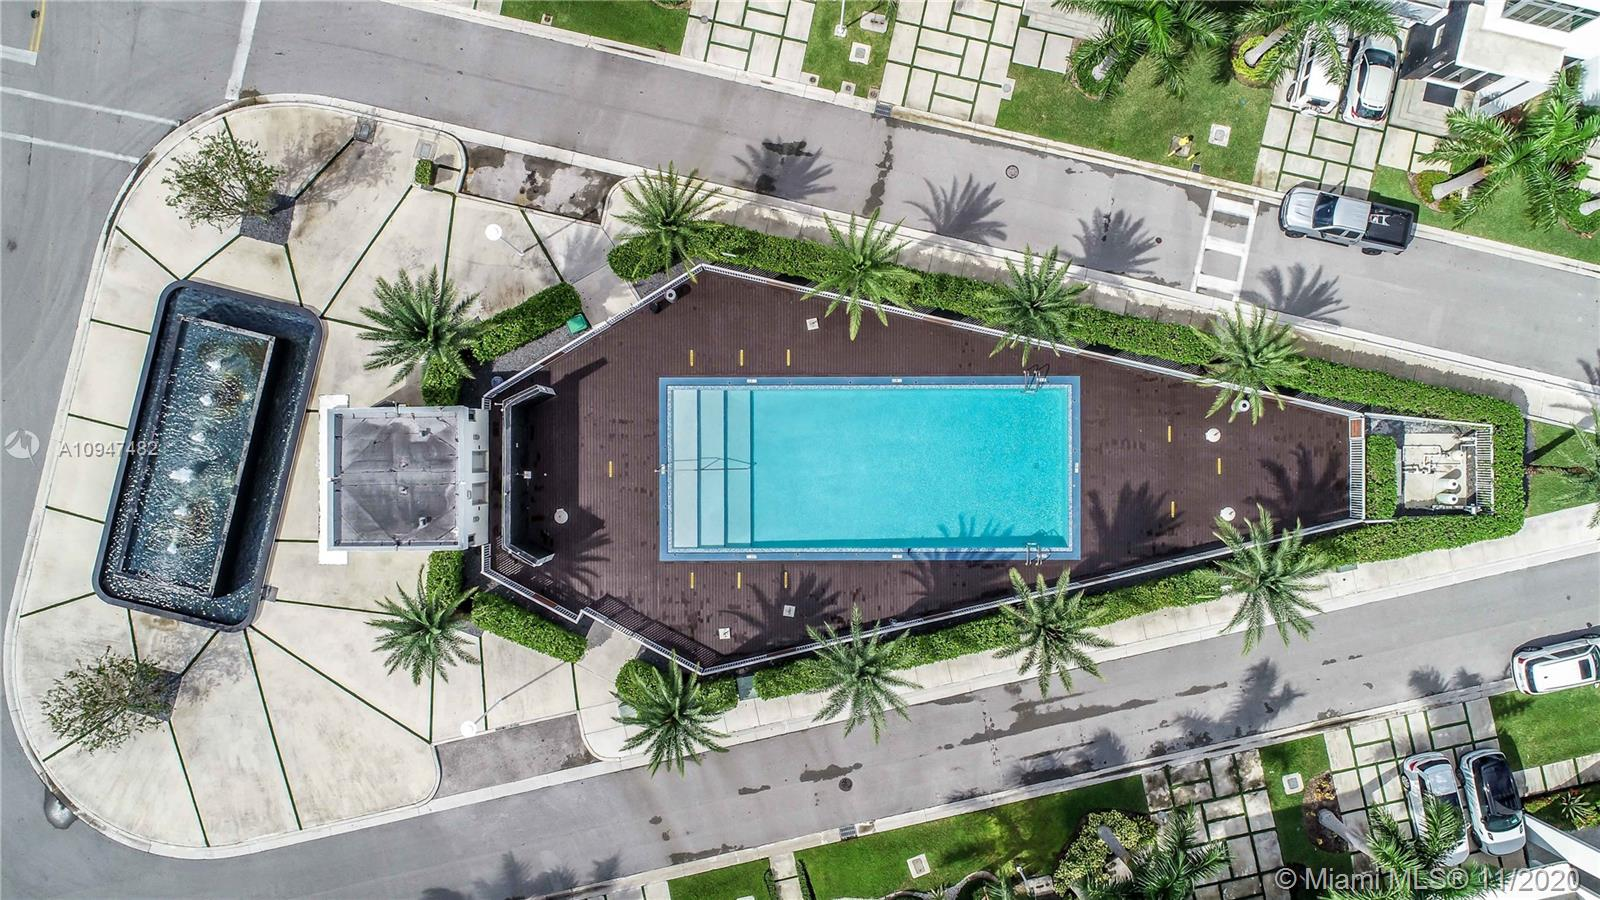 Oasis Park Square - 8283 NW 33rd Ter, Doral, FL 33122